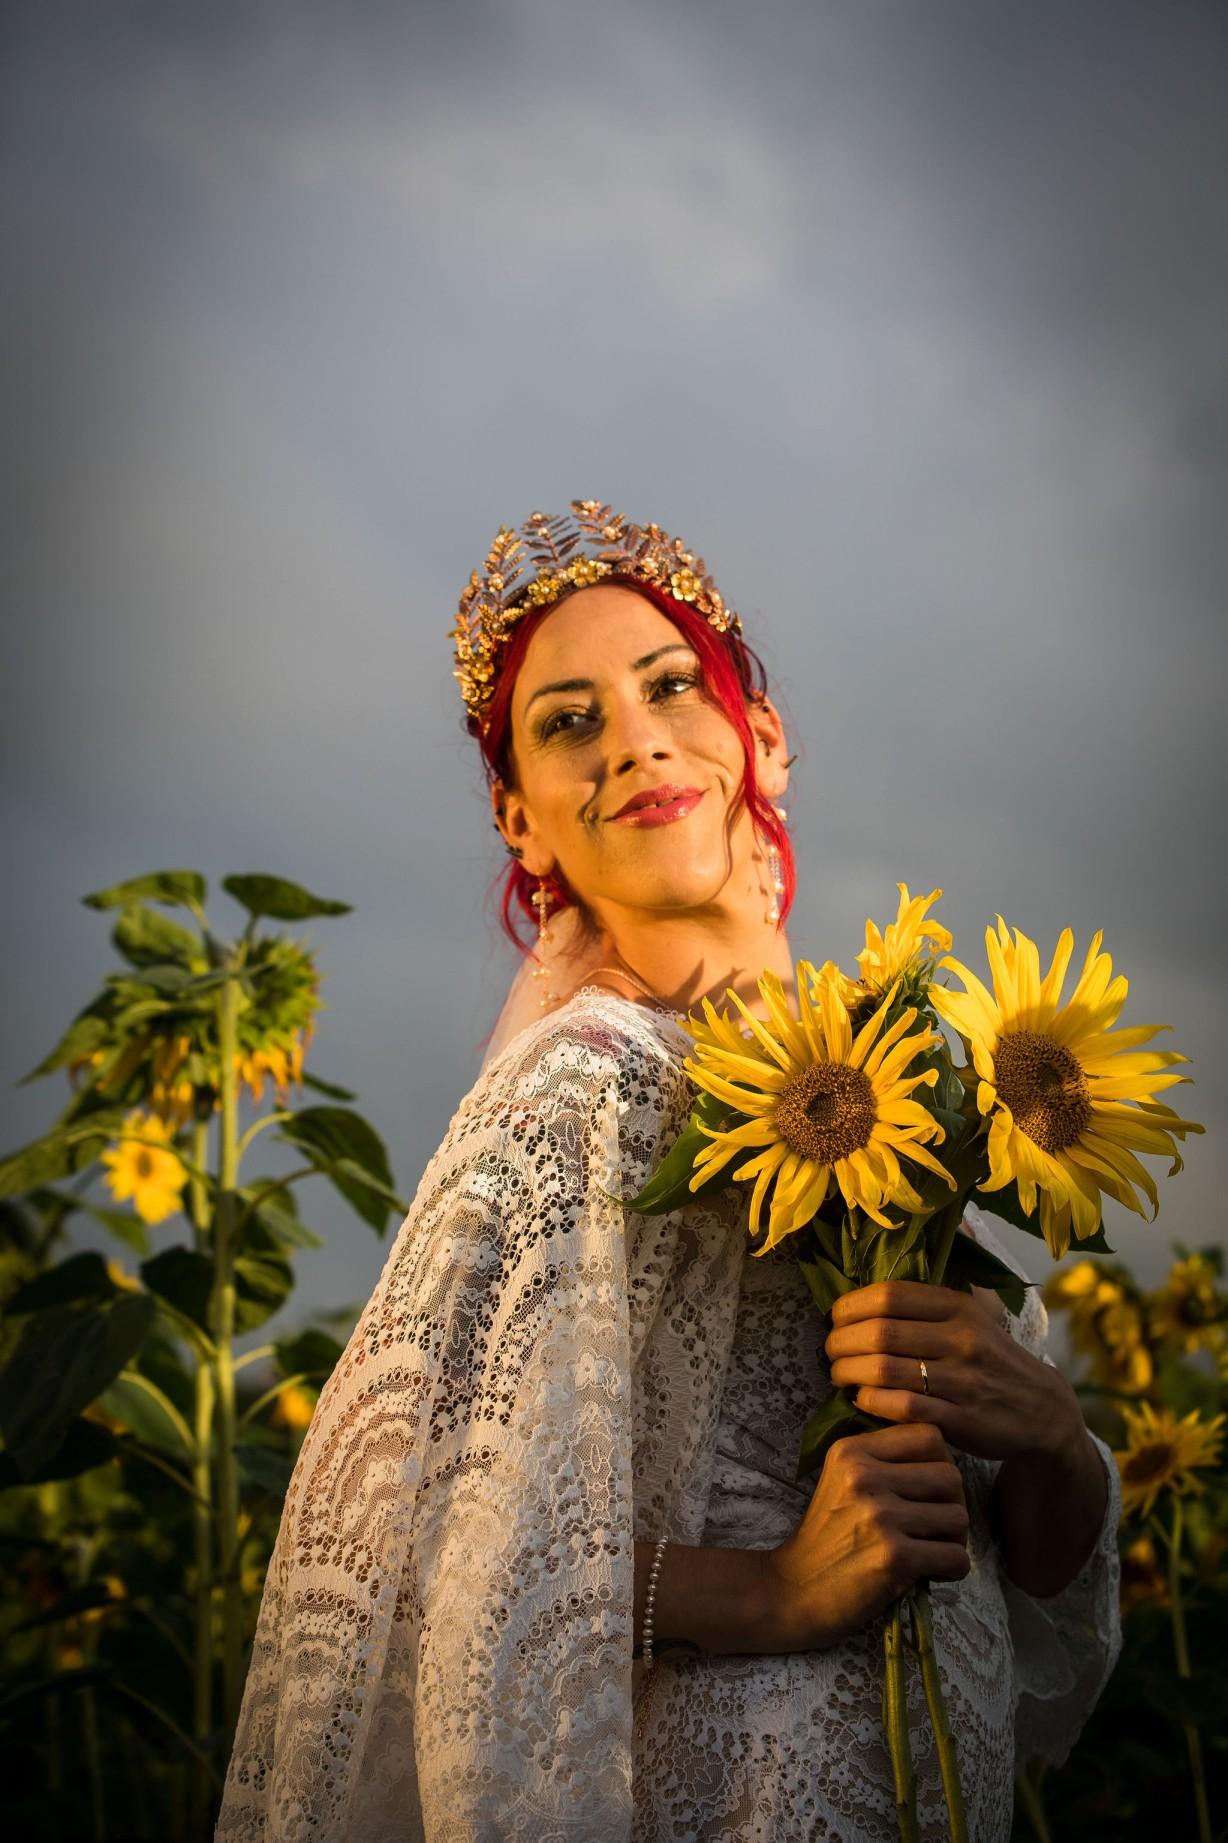 sunflower themed wedding - unconventional wedding - sunflower wedding - autumn wedding - alternative wedding planning - alternative wedding